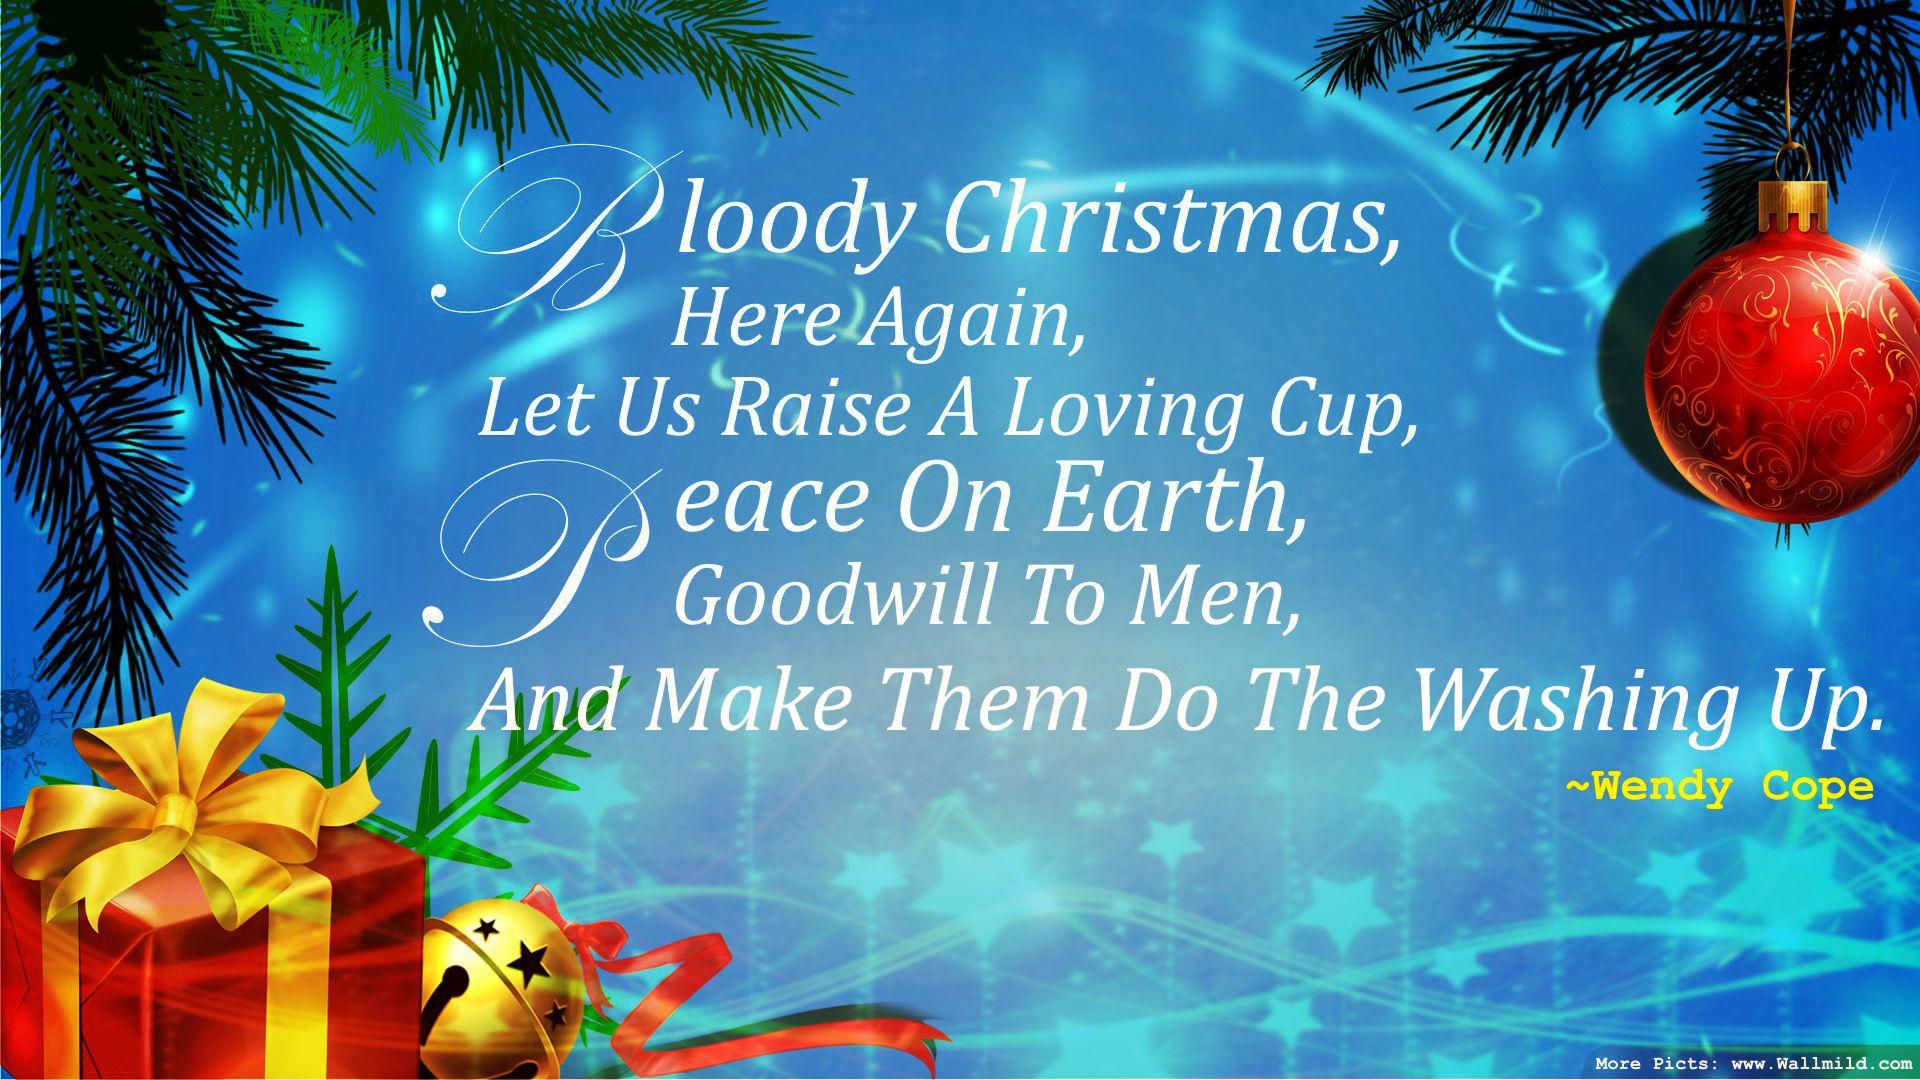 Holiday Season Quotes Inspirational Quotesgram: Christmas Christian Inspirational Quotes. QuotesGram